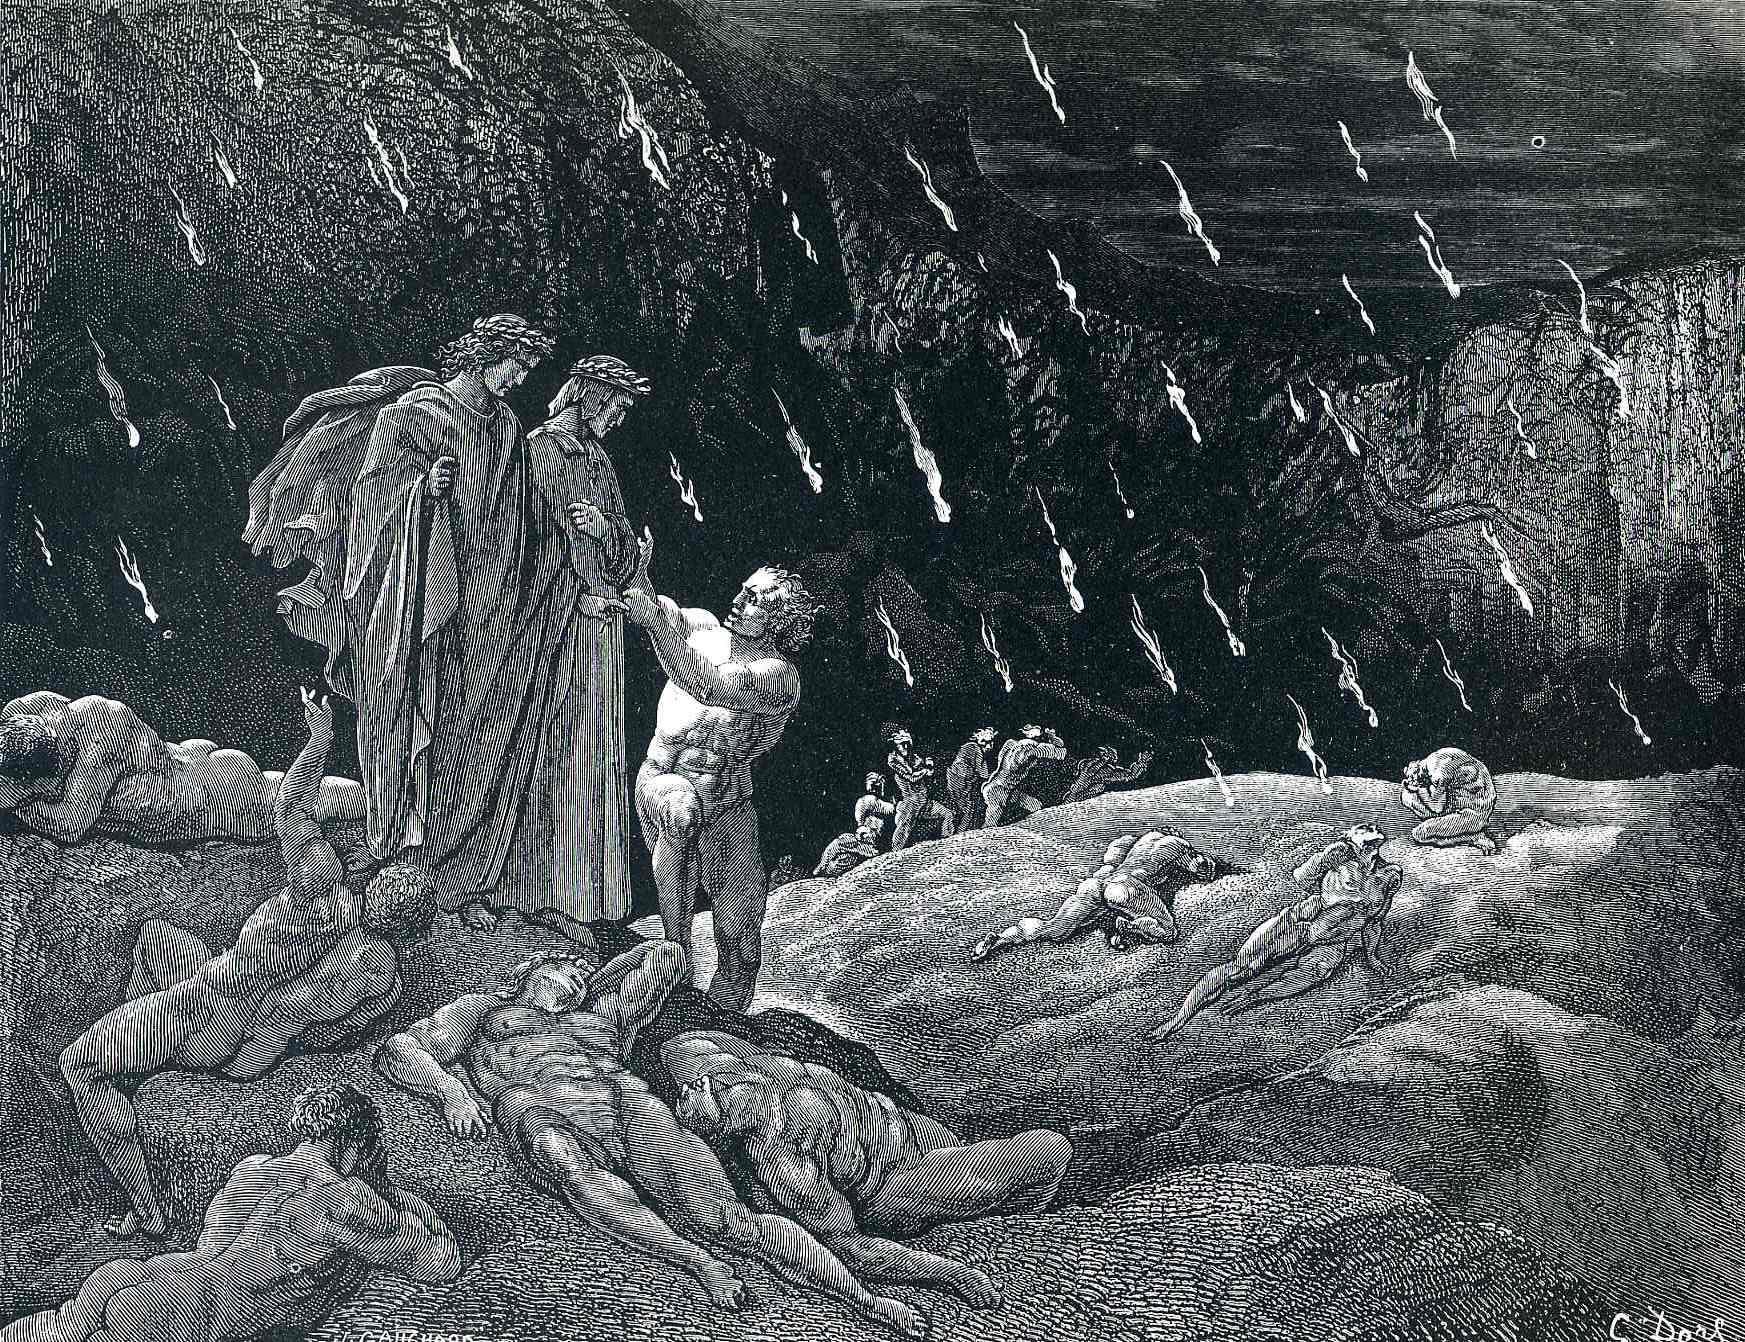 Картины, гравюры - Гюстав Доре / Pictures ...: nevsepic.com.ua/art-i-risovanaya-grafika/page,34,18664-kartiny...